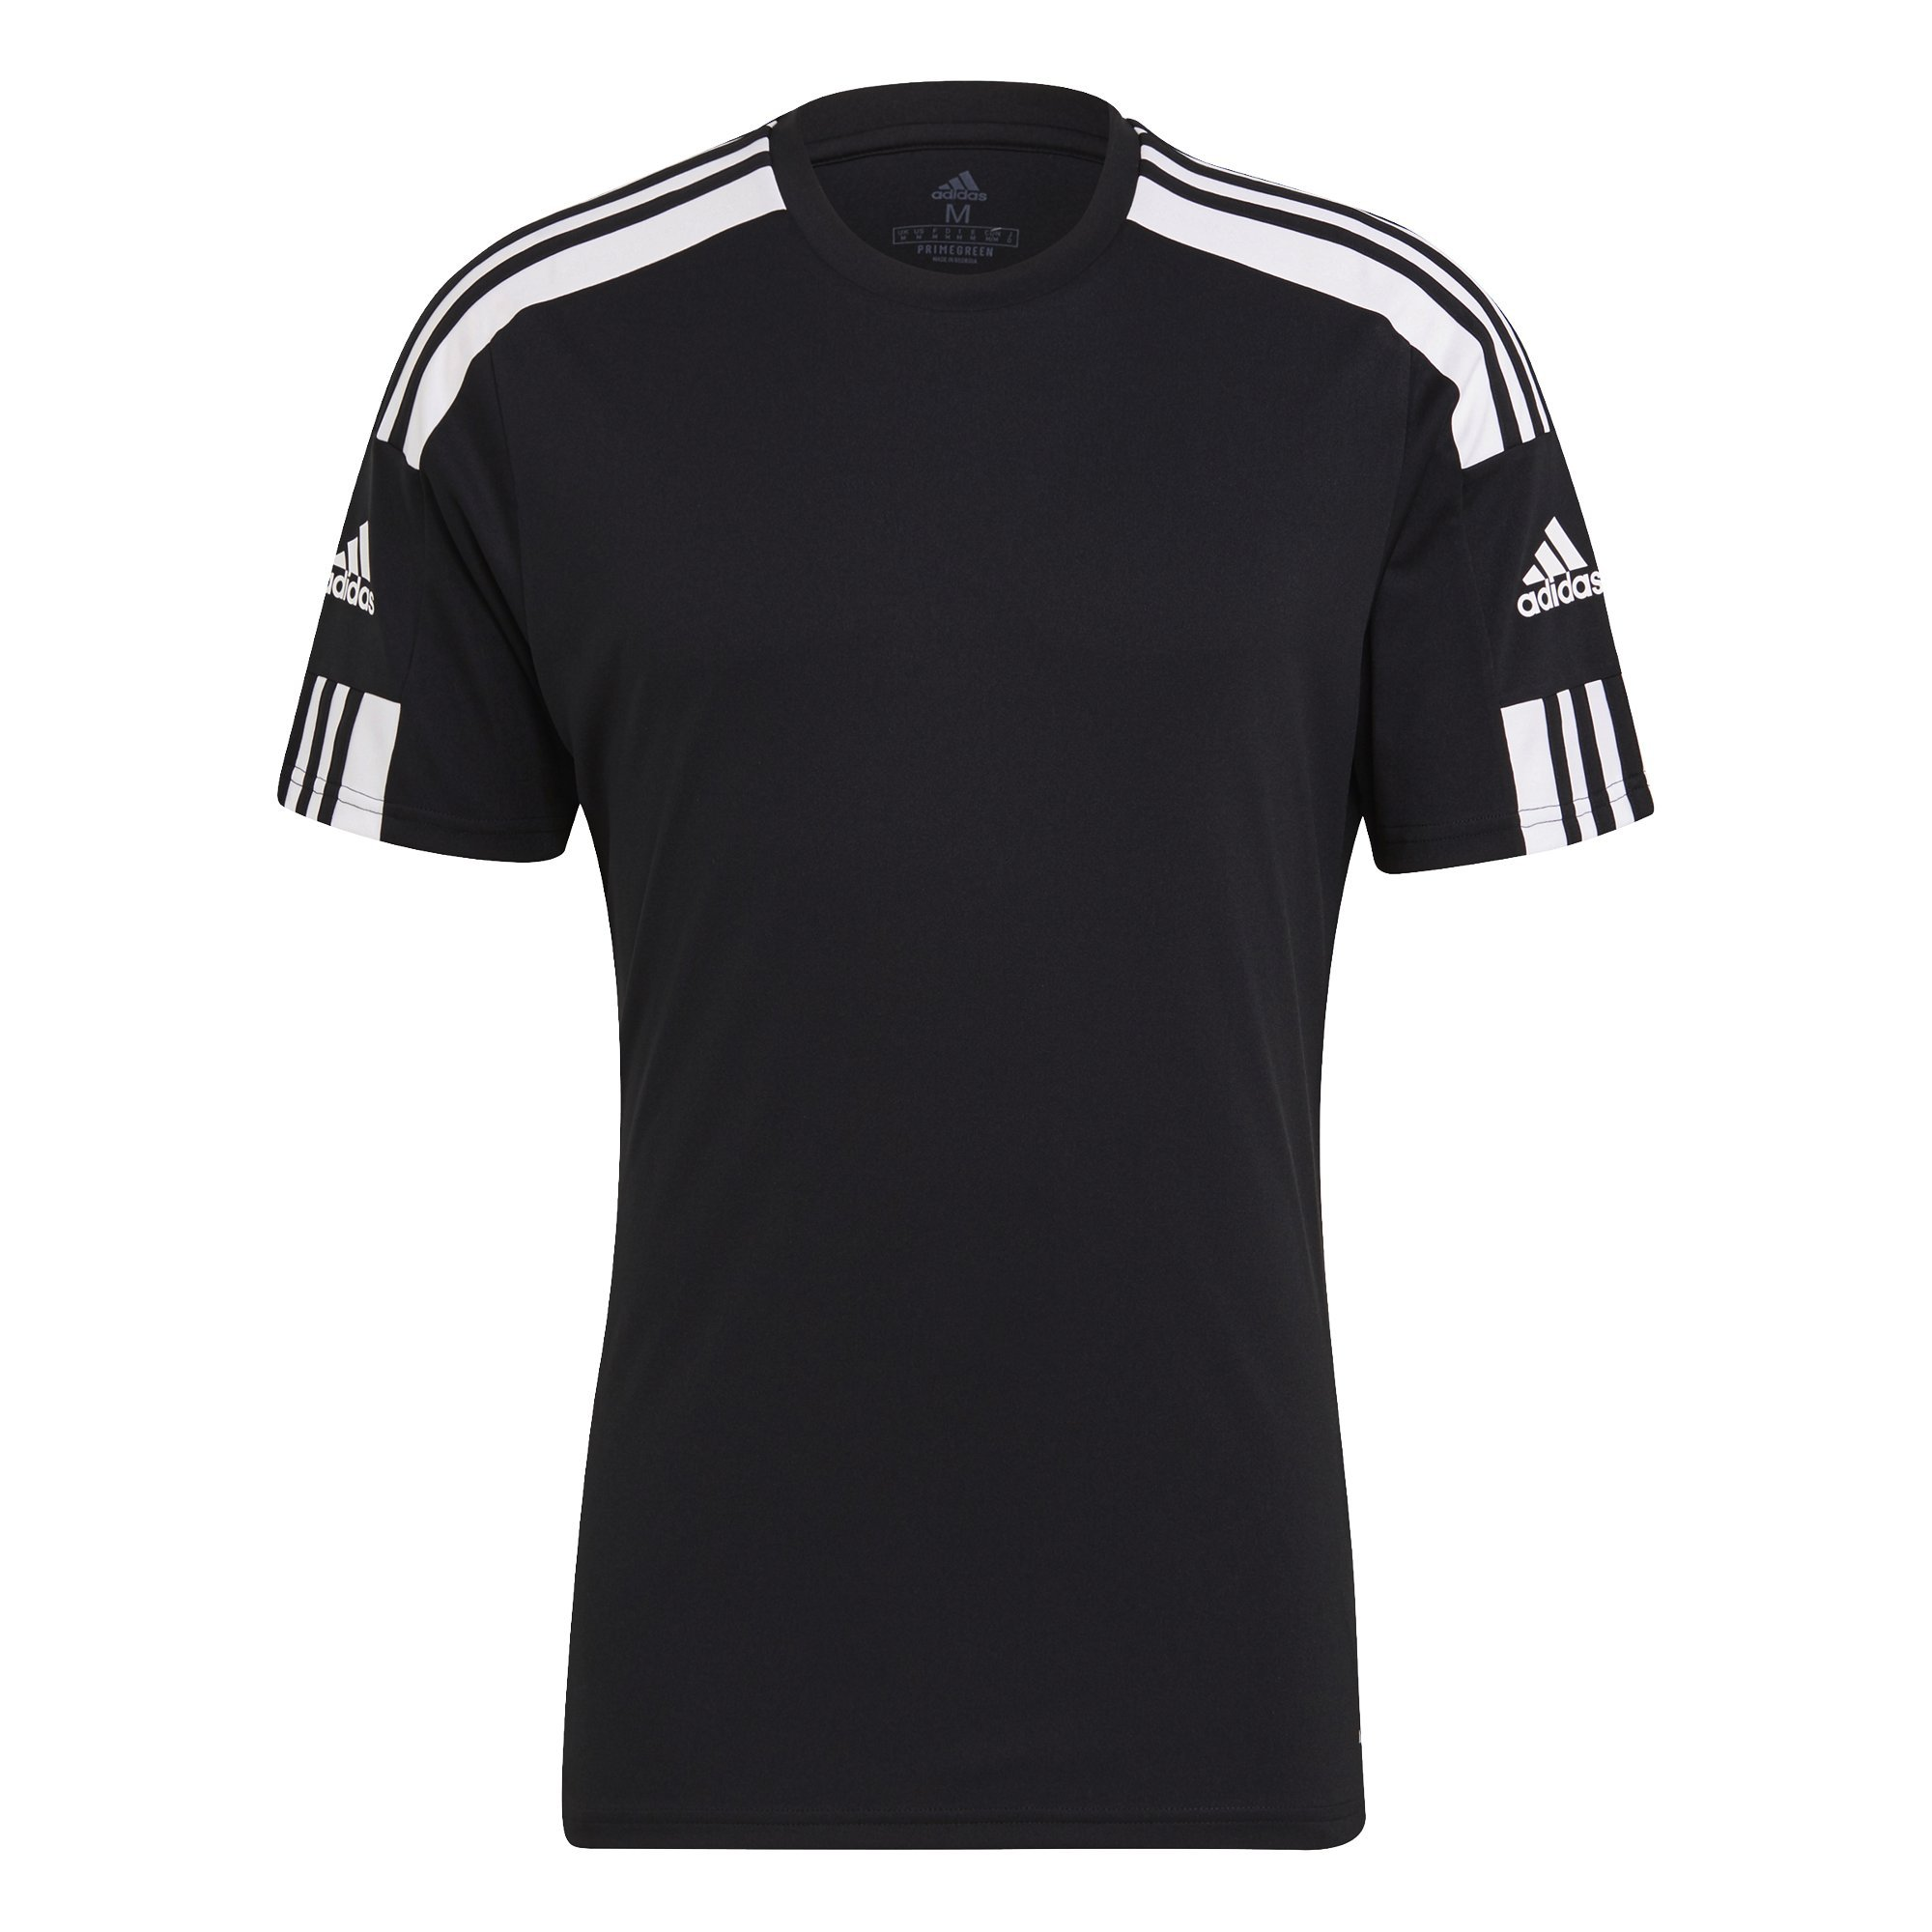 adidas Squadra 21 Voetbalshirt Zwart Wit